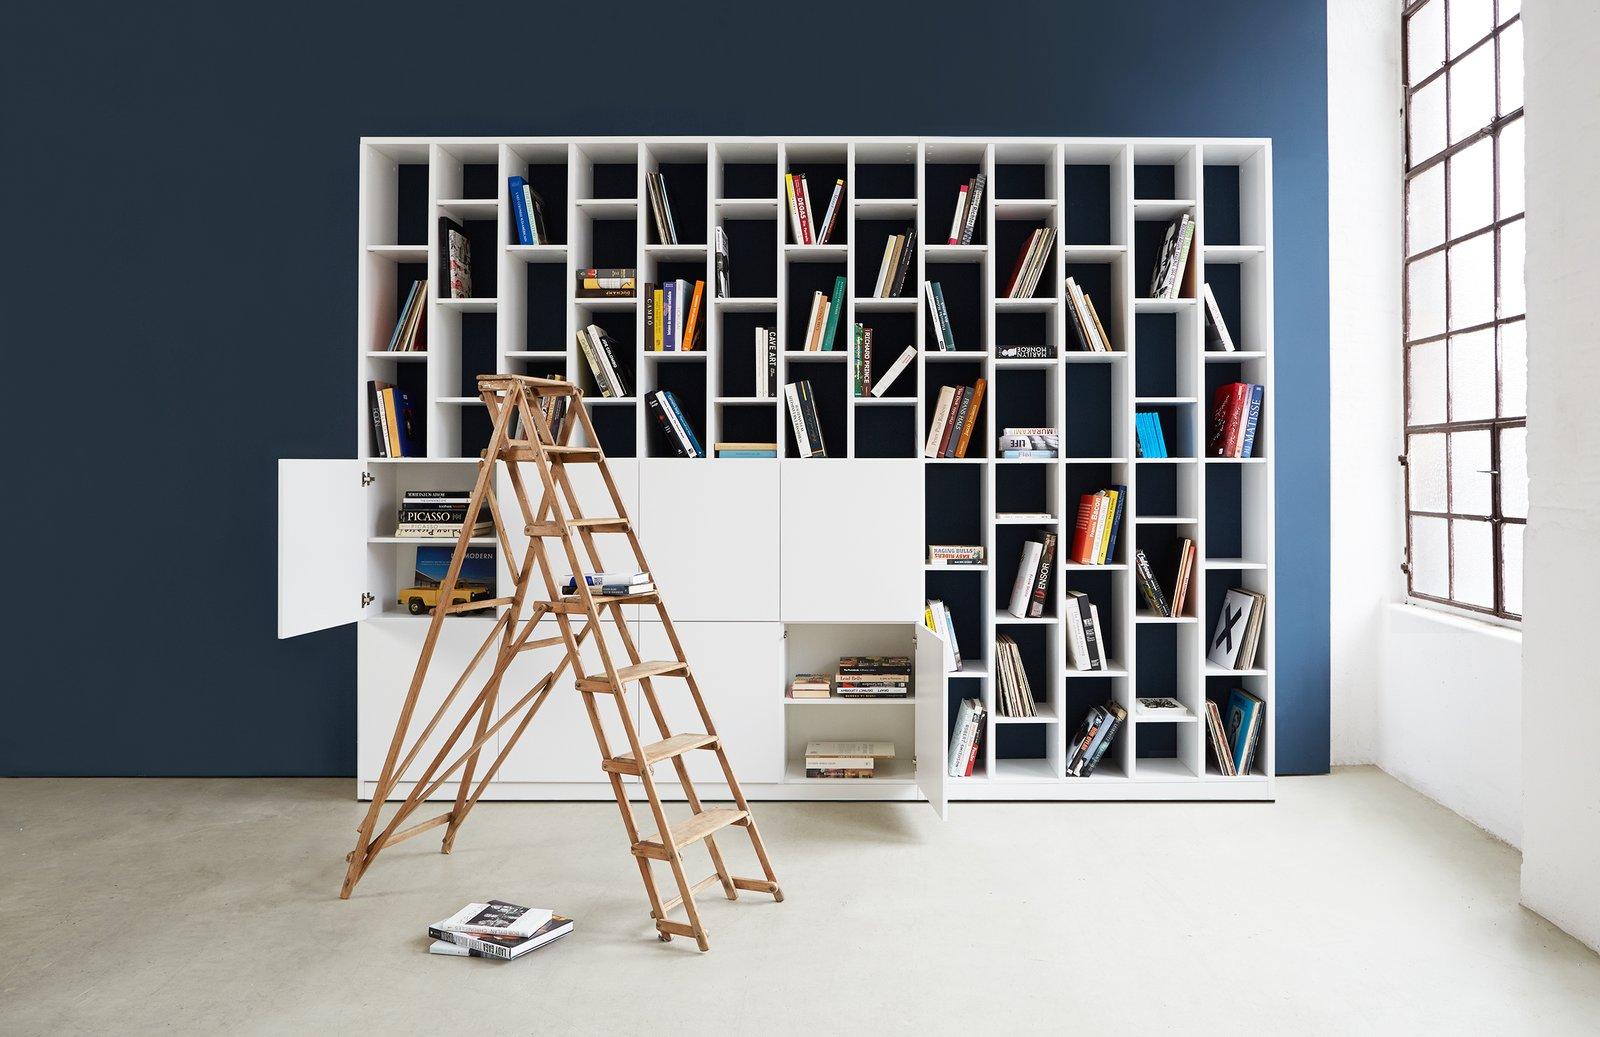 Hem customizable shelves Shape-Shifters: Modular Furniture by Heather Corcoran